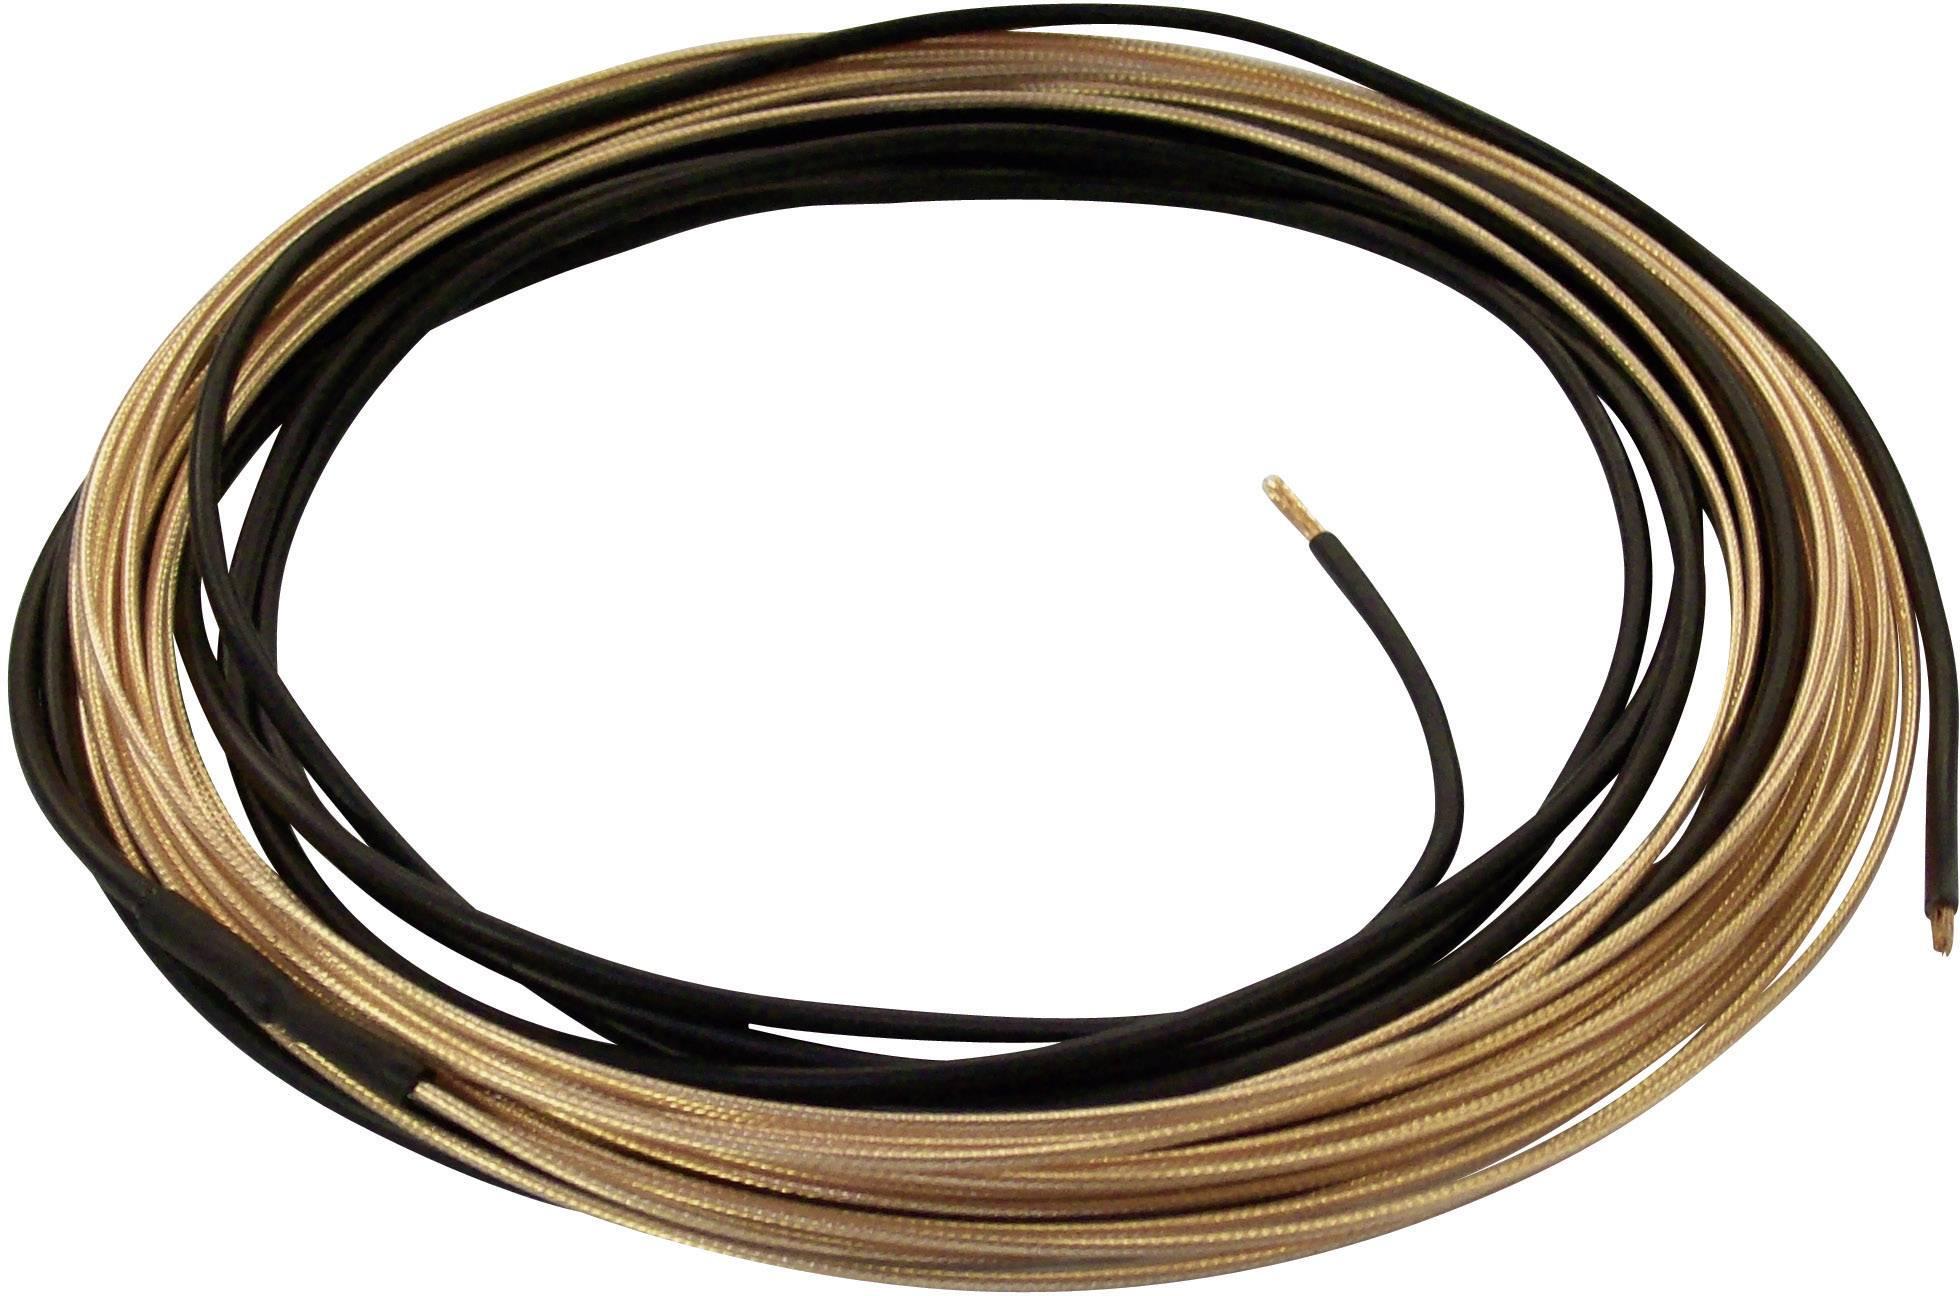 Topný kabel Arnold Rak HK-5.0-12, 12 V/75 W, 5 m